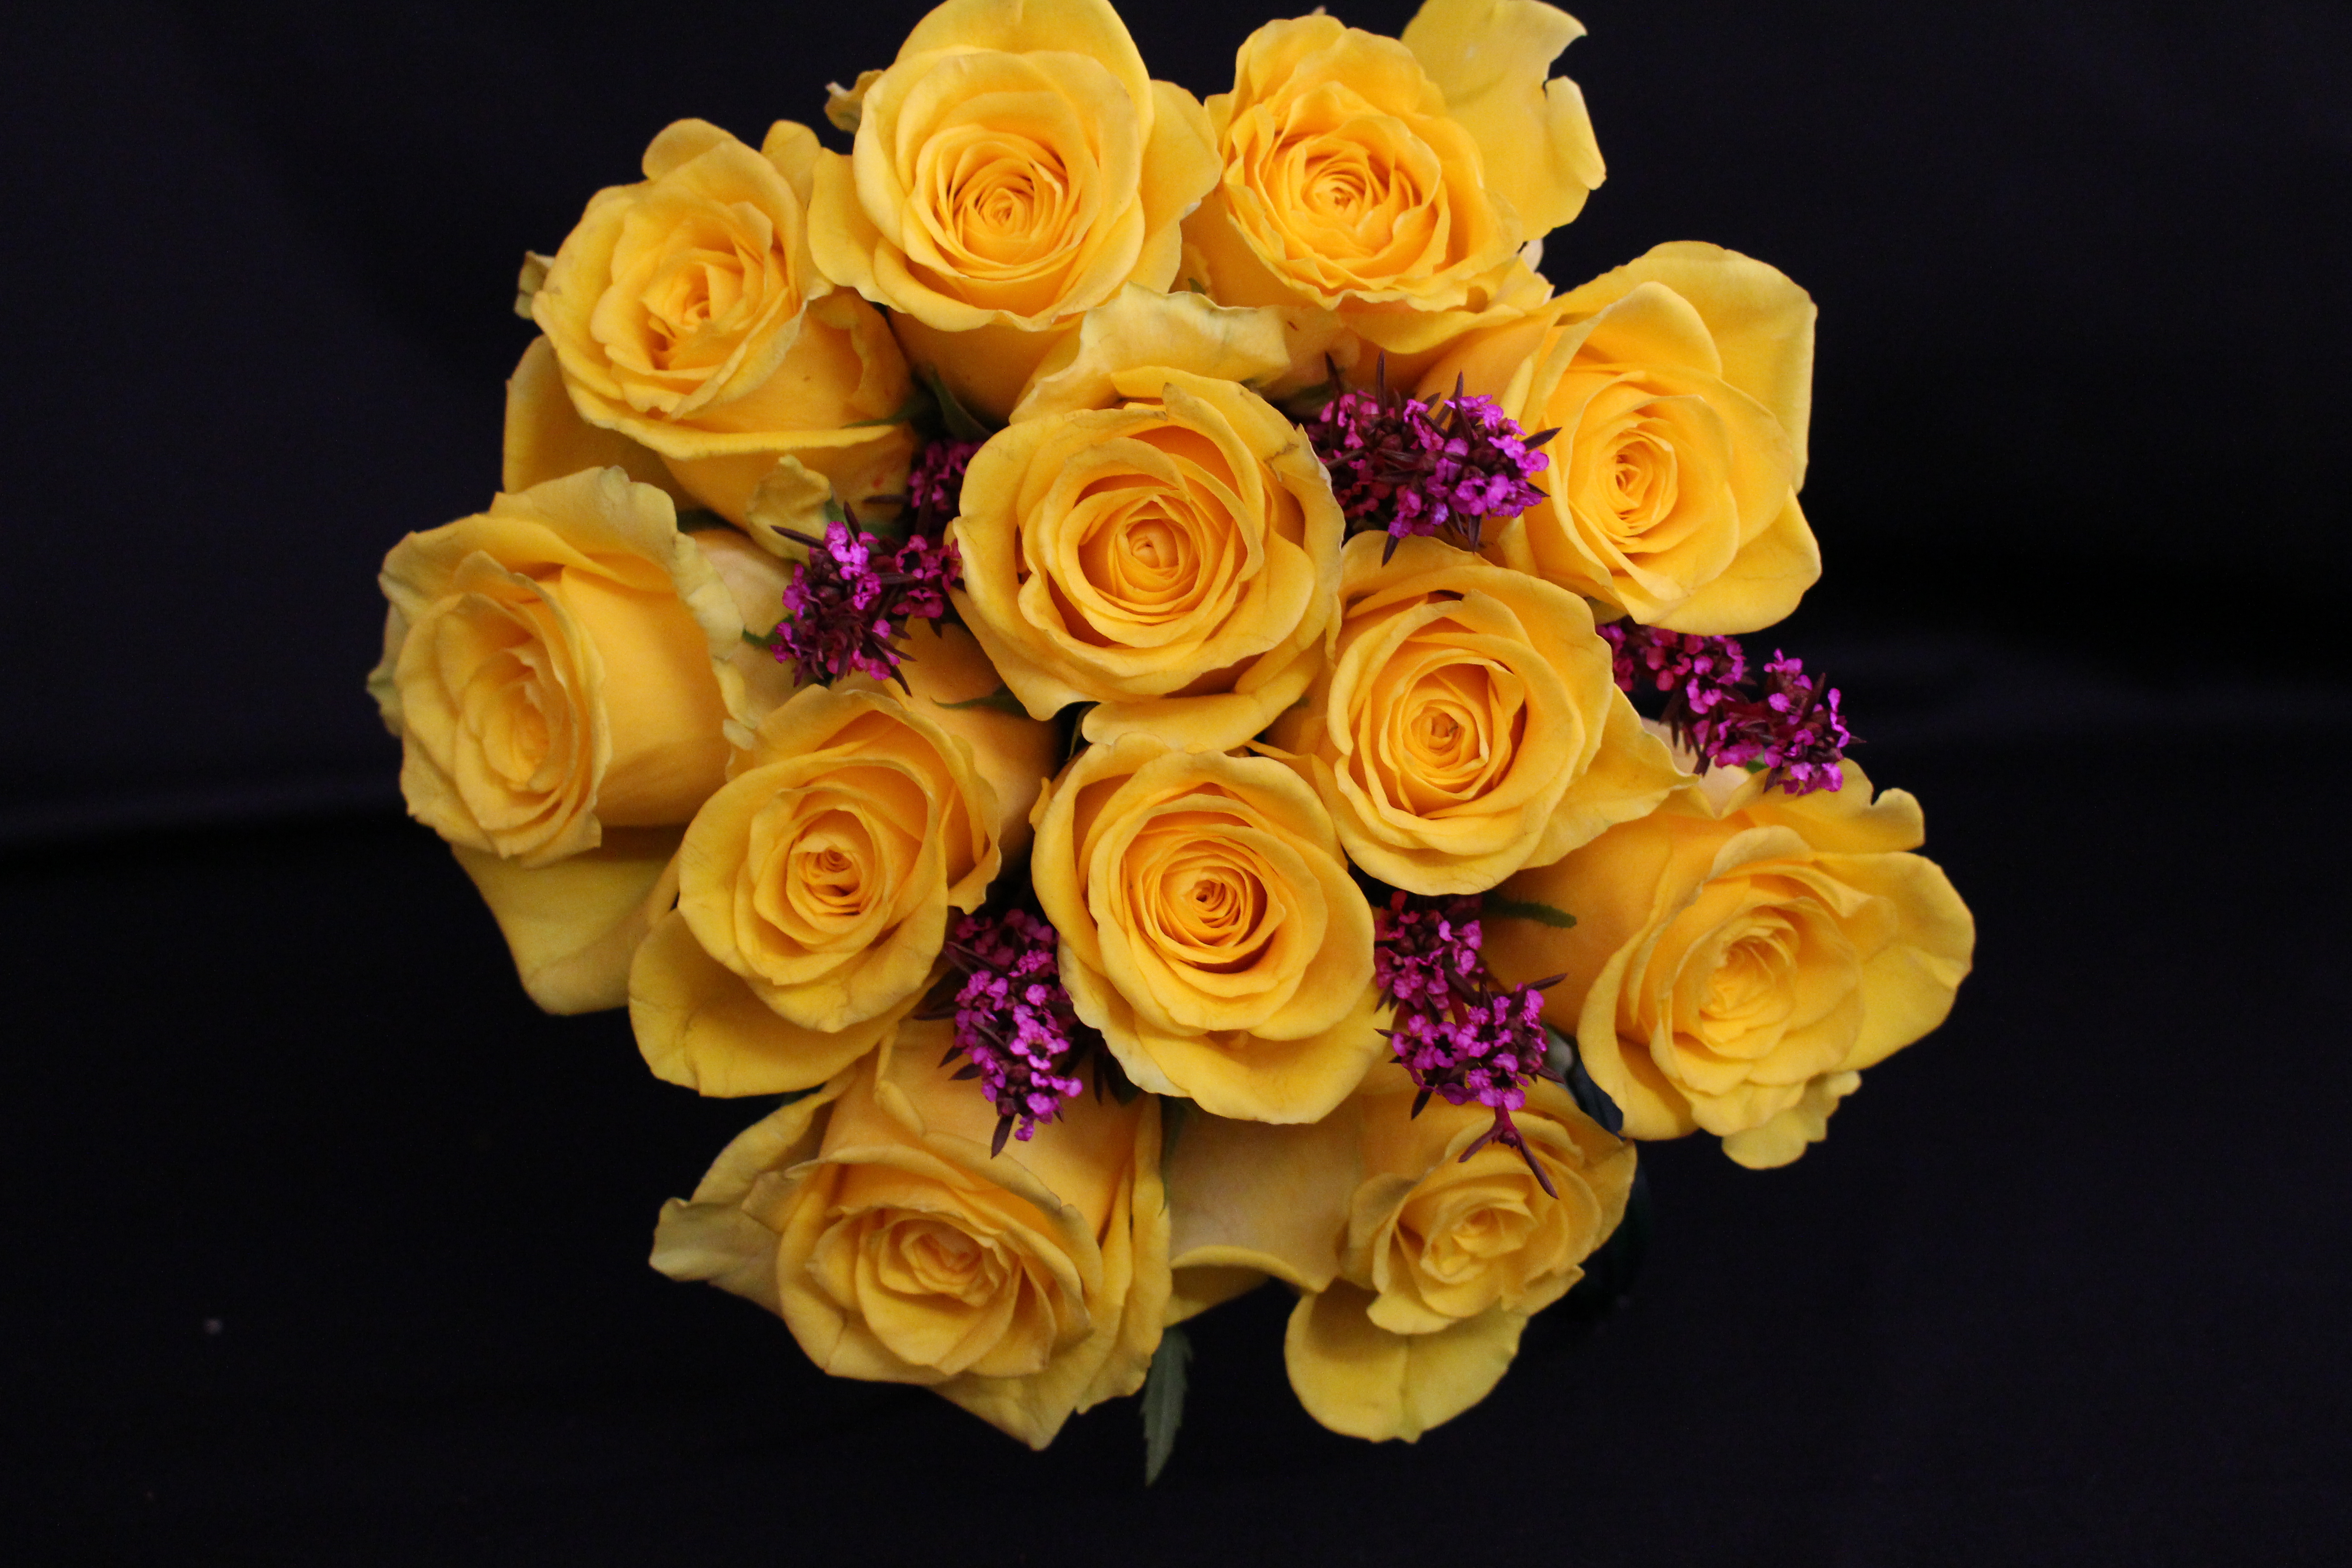 Kenyan roses yellow wedding bouquet flowers of bethlehem 7000 mightylinksfo